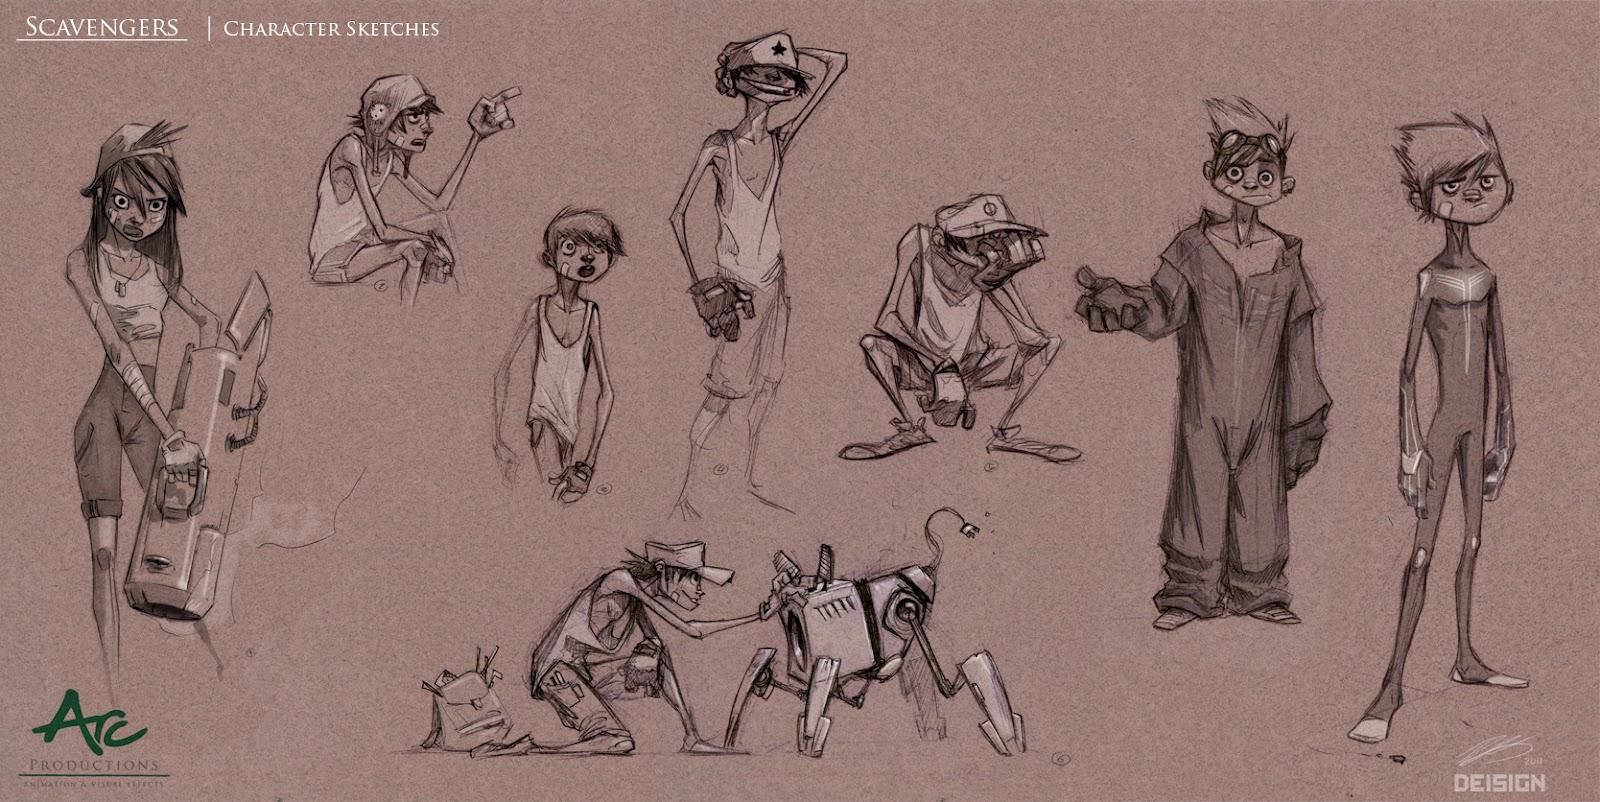 http://4.bp.blogspot.com/-fuiH7BnVHLk/UDvhk78dTmI/AAAAAAAACDM/RNX_hXbeEIA/s1600/DEISIGN_Scavengers_Character_Sketches.jpg